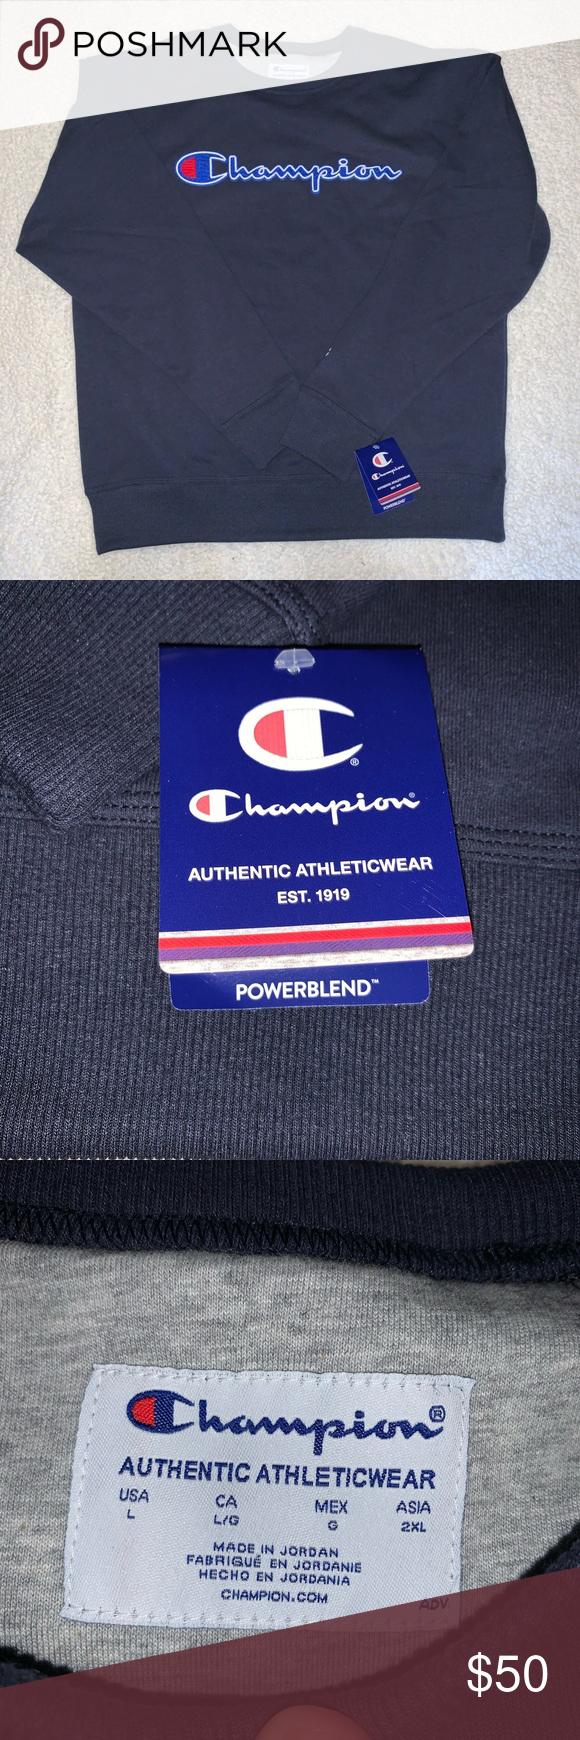 Champion Sweatshirt Authentic Athleticwear Size Large Champion Sweaters Champion Sweatshirt Sweatshirts Clothes Design [ 1740 x 580 Pixel ]